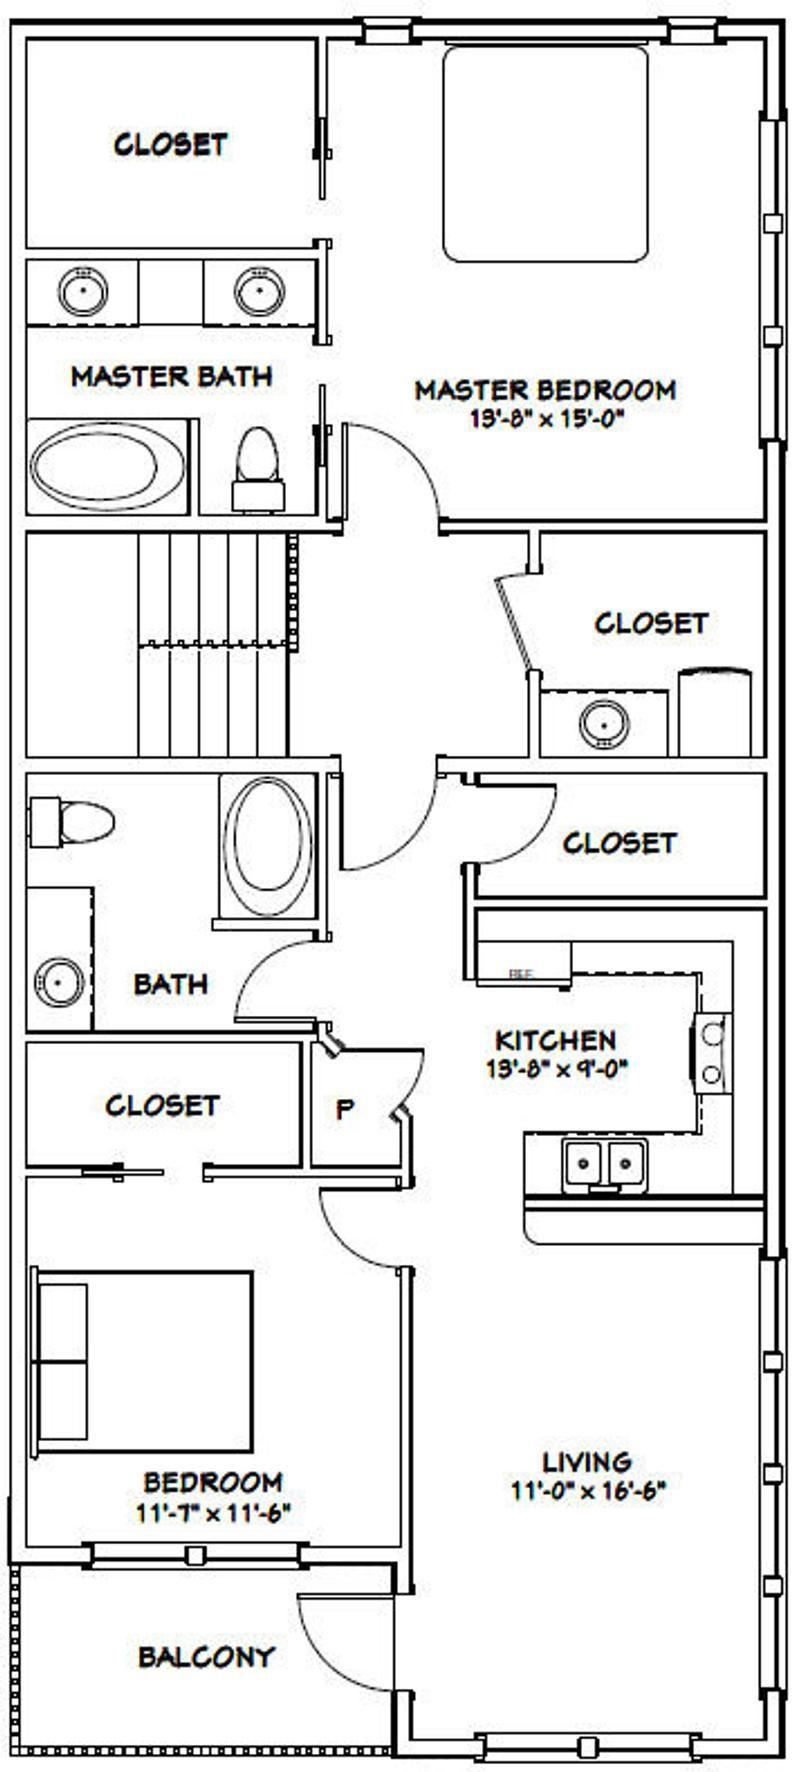 44x48 House 2 Bedroom 2 5 Bath 1645 Sq Ft Pdf Floor Etsy In 2021 Garage Floor Plans Garage Plans With Loft Garage House Plans